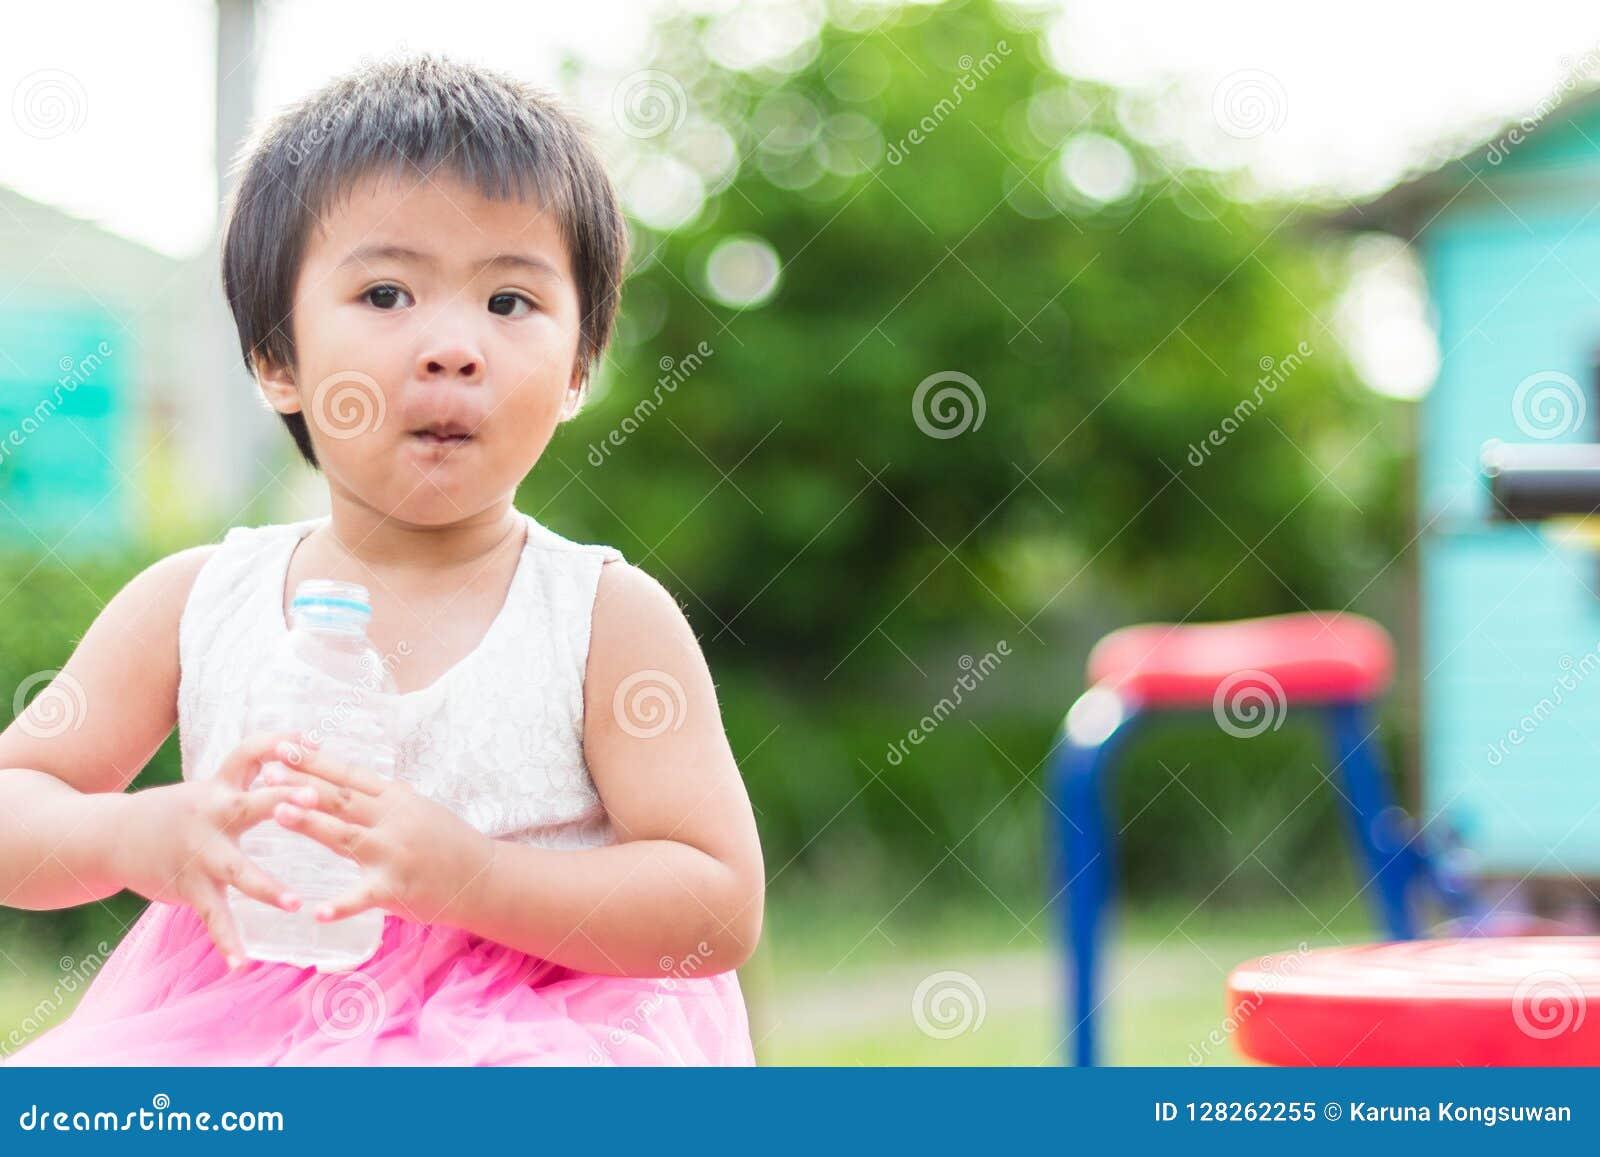 Asian little cute girl drinking clean water from plastic bottle